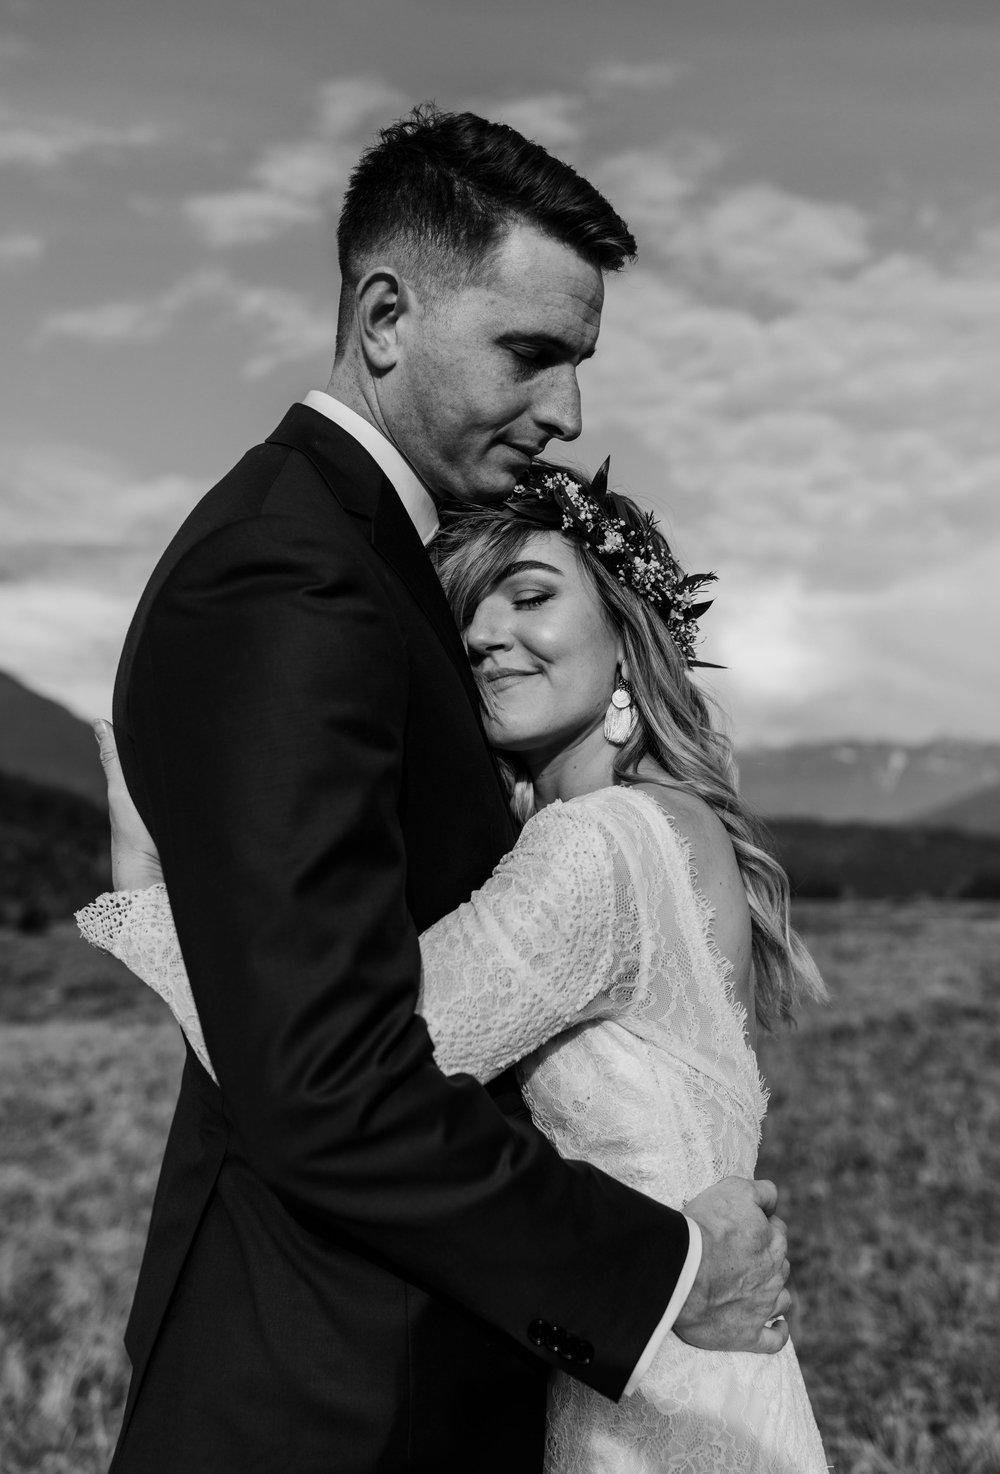 Sunshine Coast Wedding Photos - Mountain Wedding Photos - Sunshine Coast Wedding Photographer - Vancouver Wedding Photographer - Jennifer Picard283-1.JPG